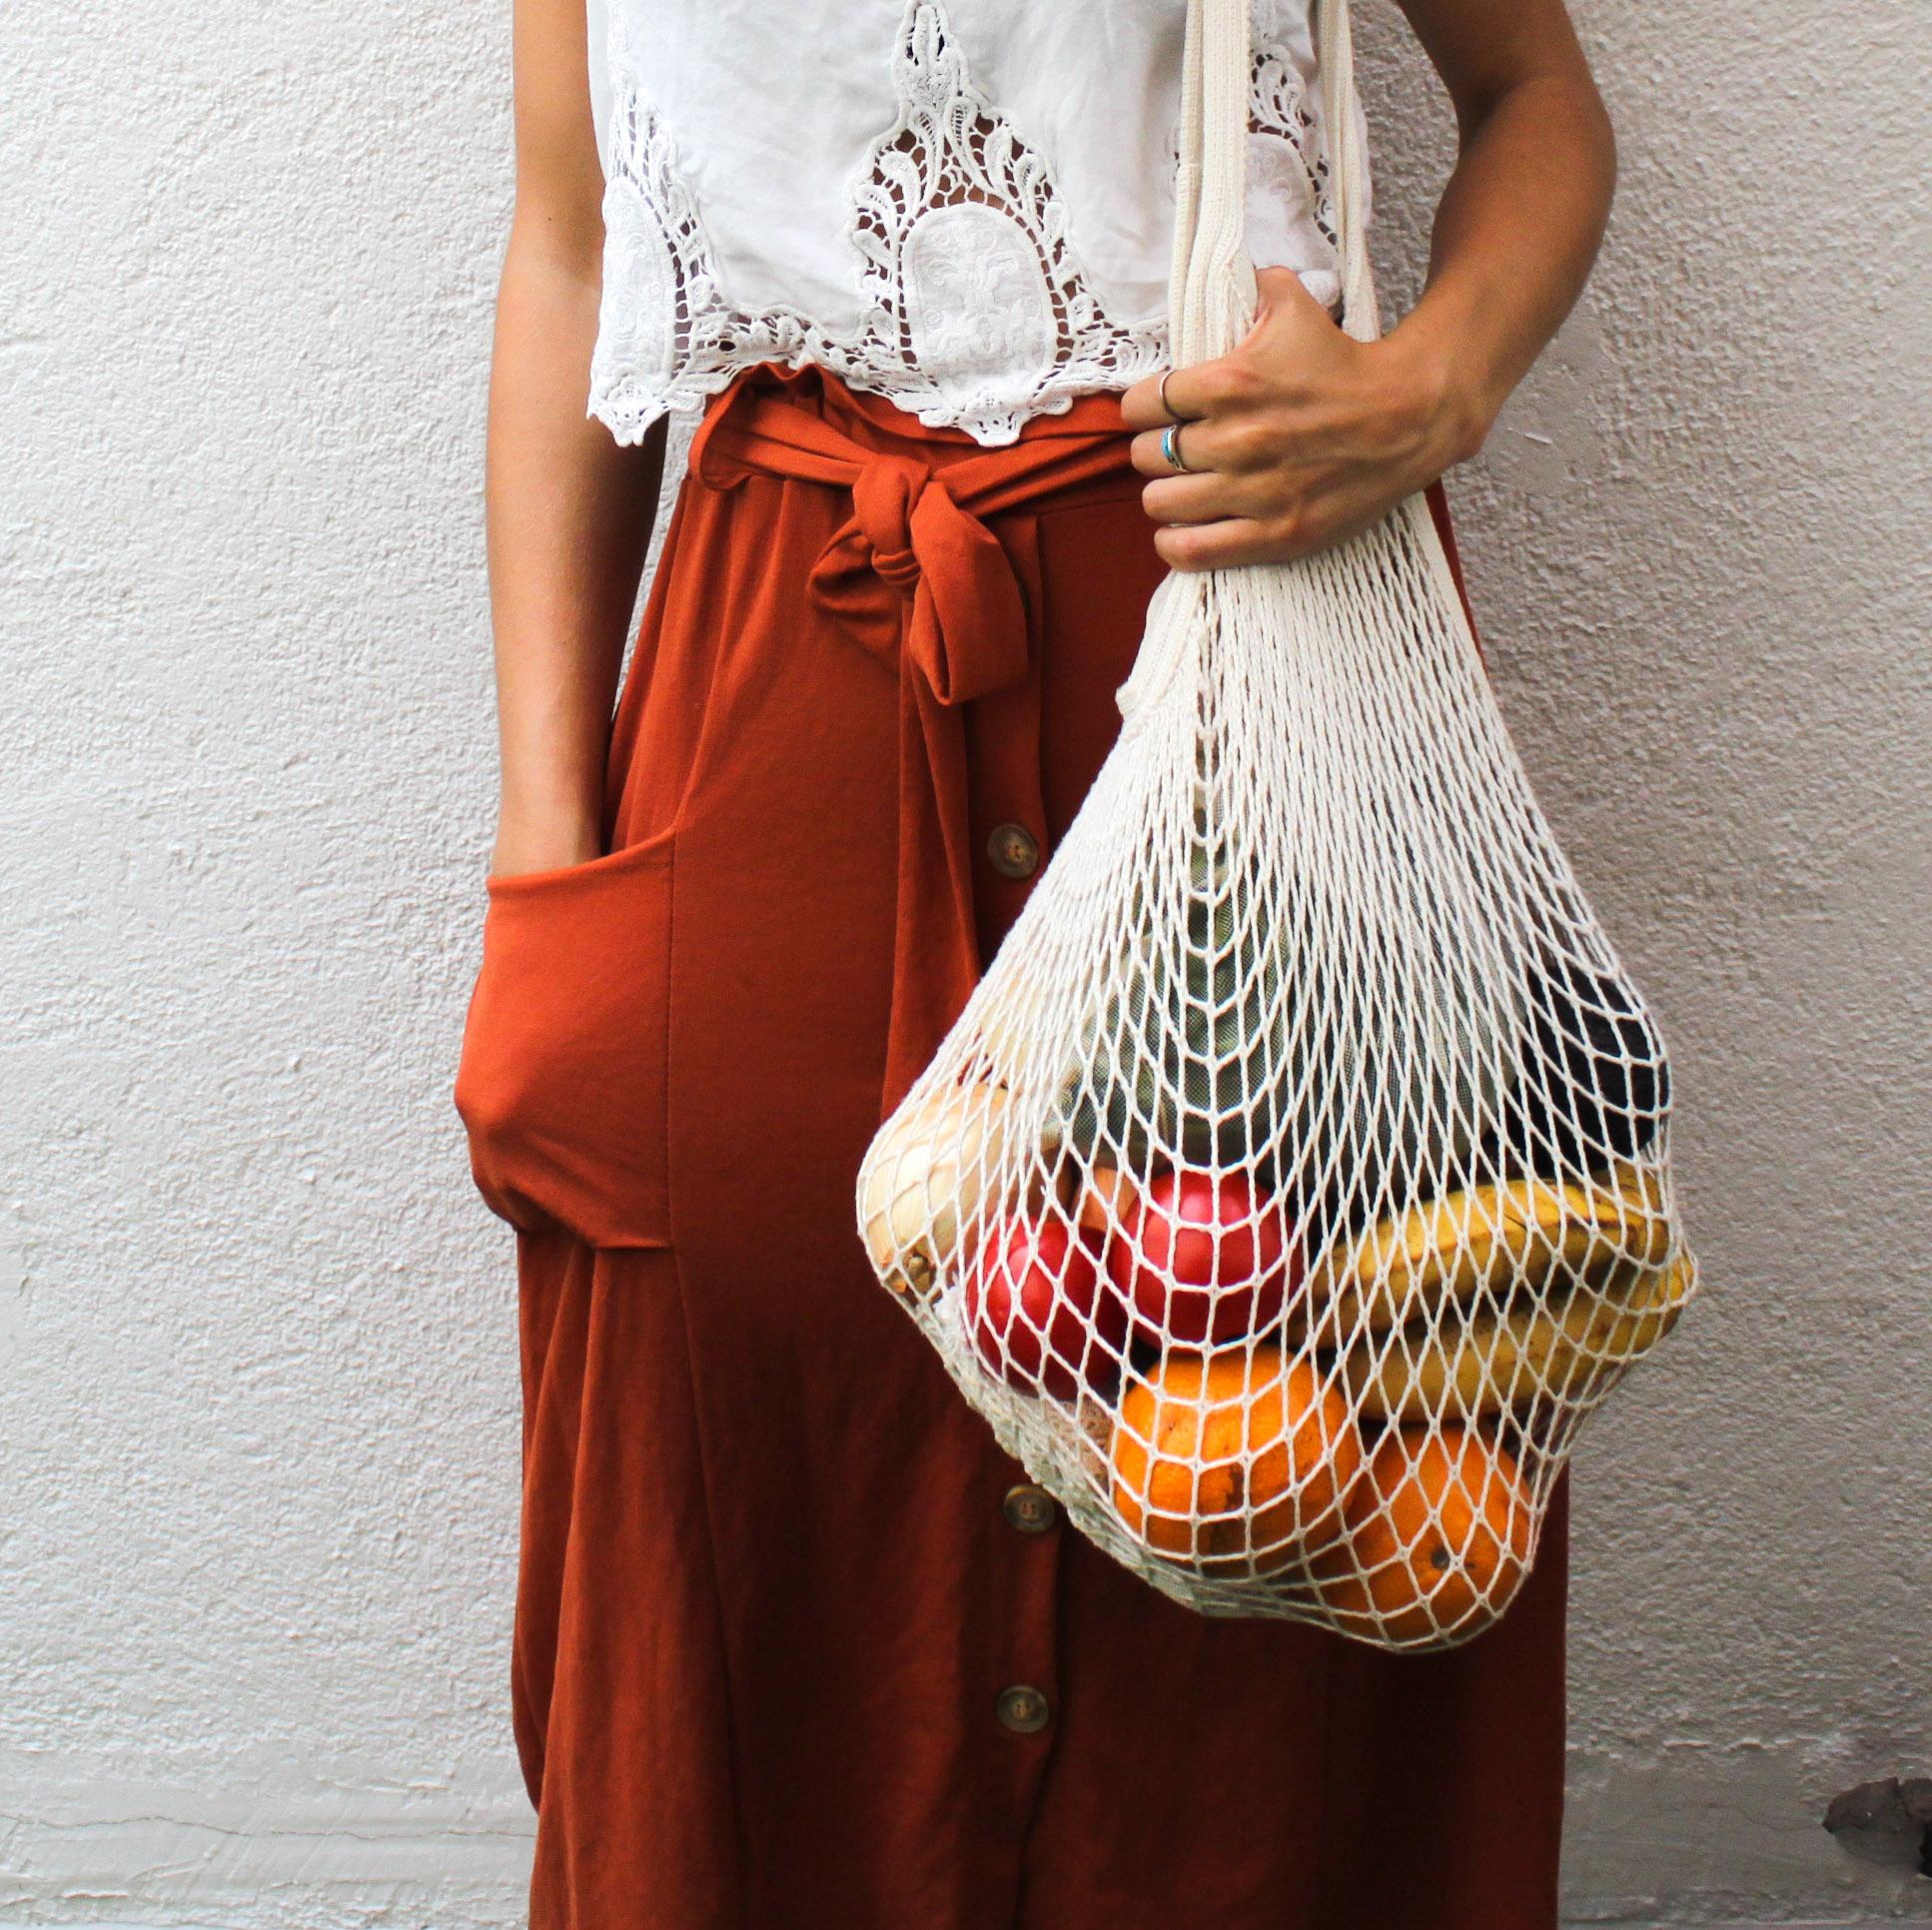 bolsa de malla para la compra